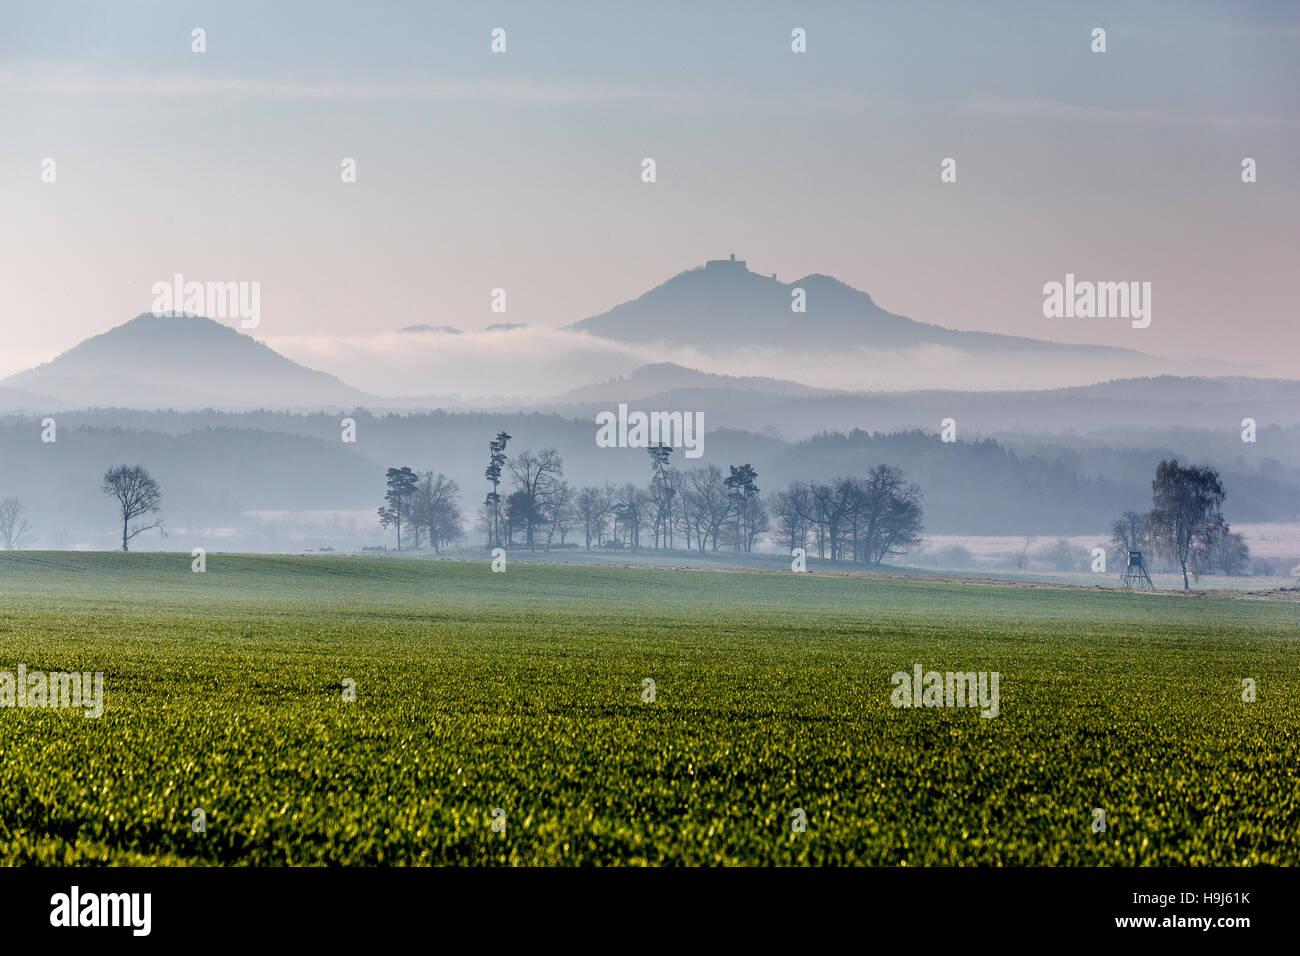 Castle Bezdez, sunrise, fogs, field, grass, Autumn, Czech republic, view from Ceska Lipa - Stock Image